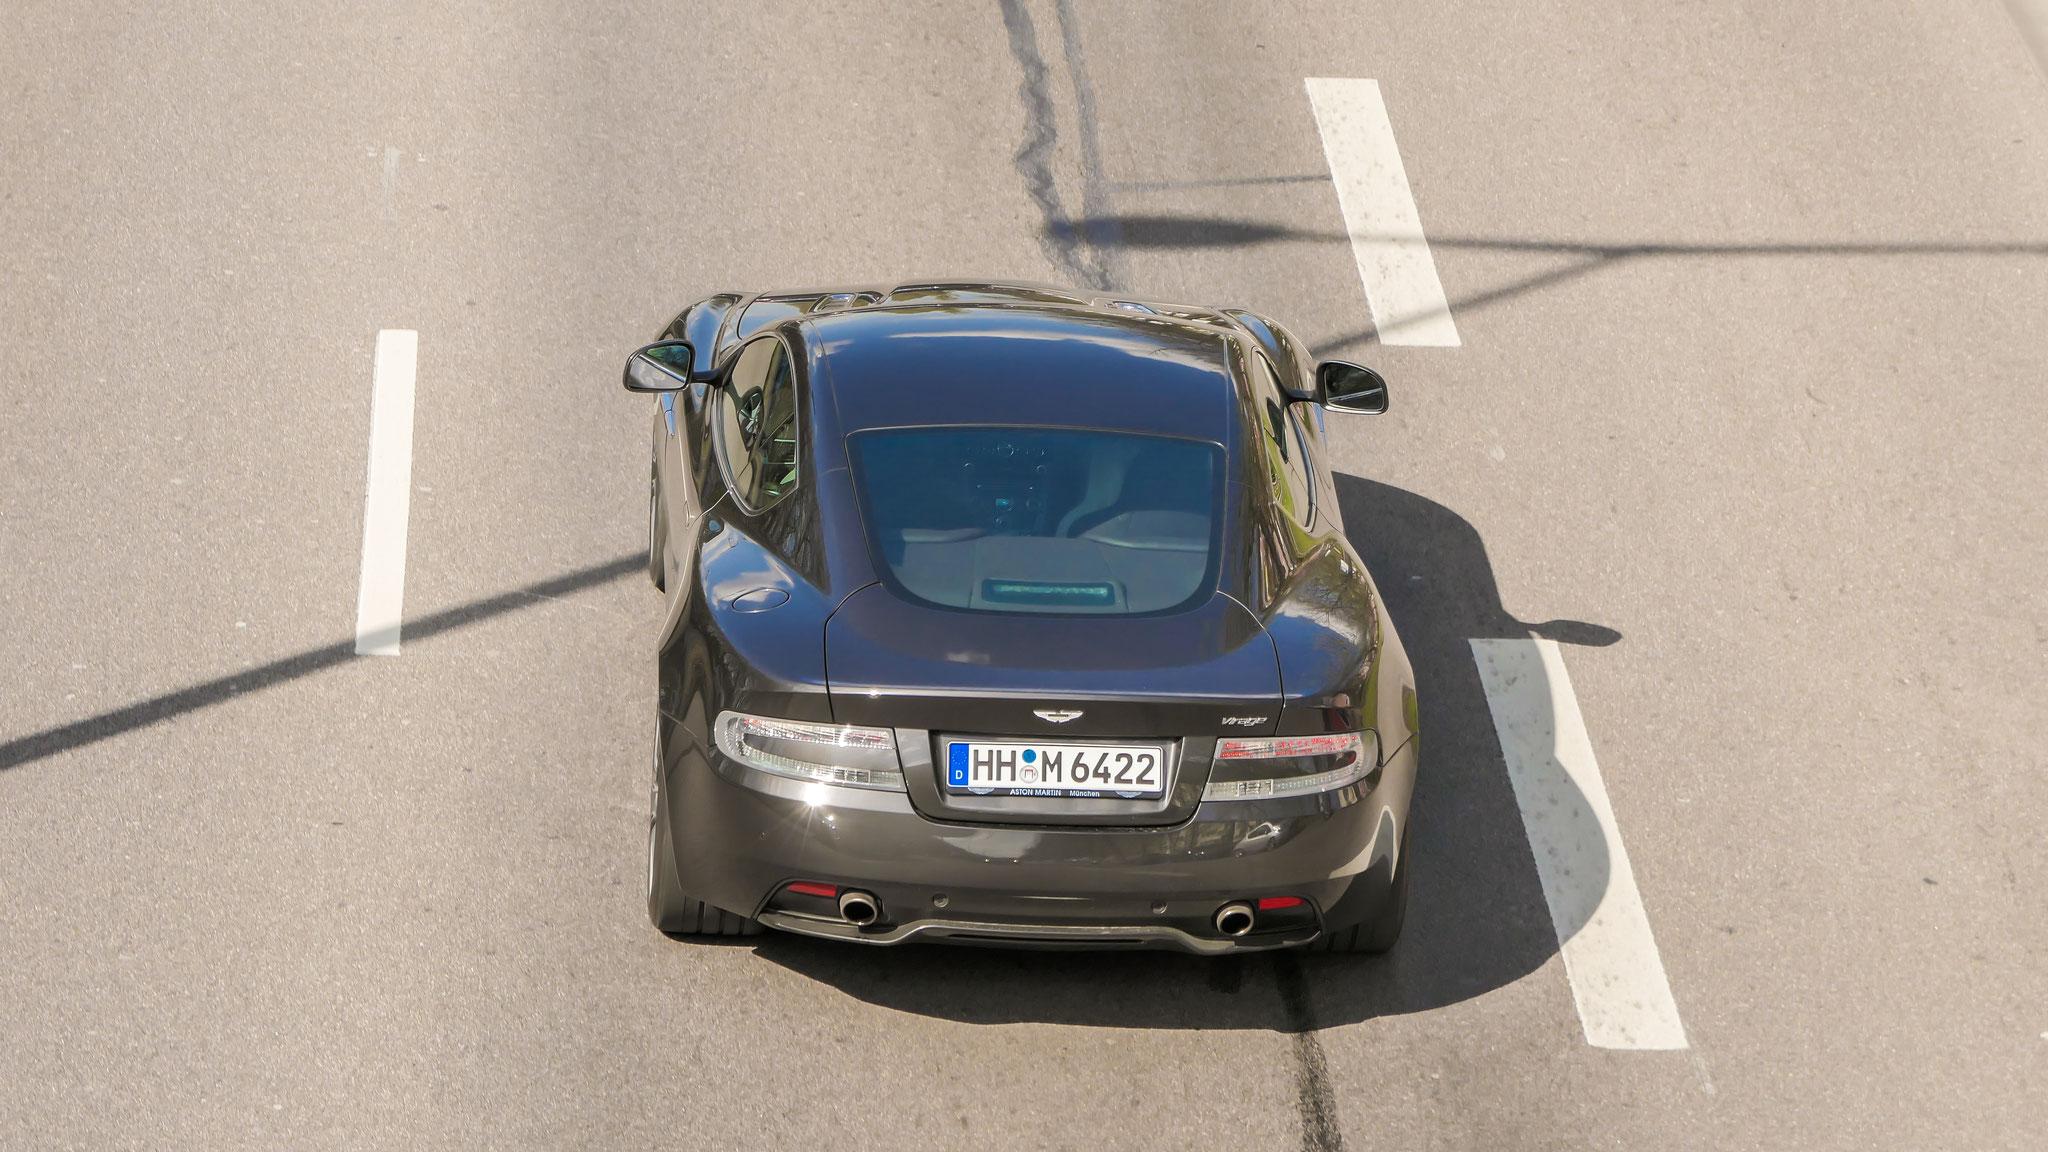 Aston Martin DB9 GT Coupé - HH-M-6422